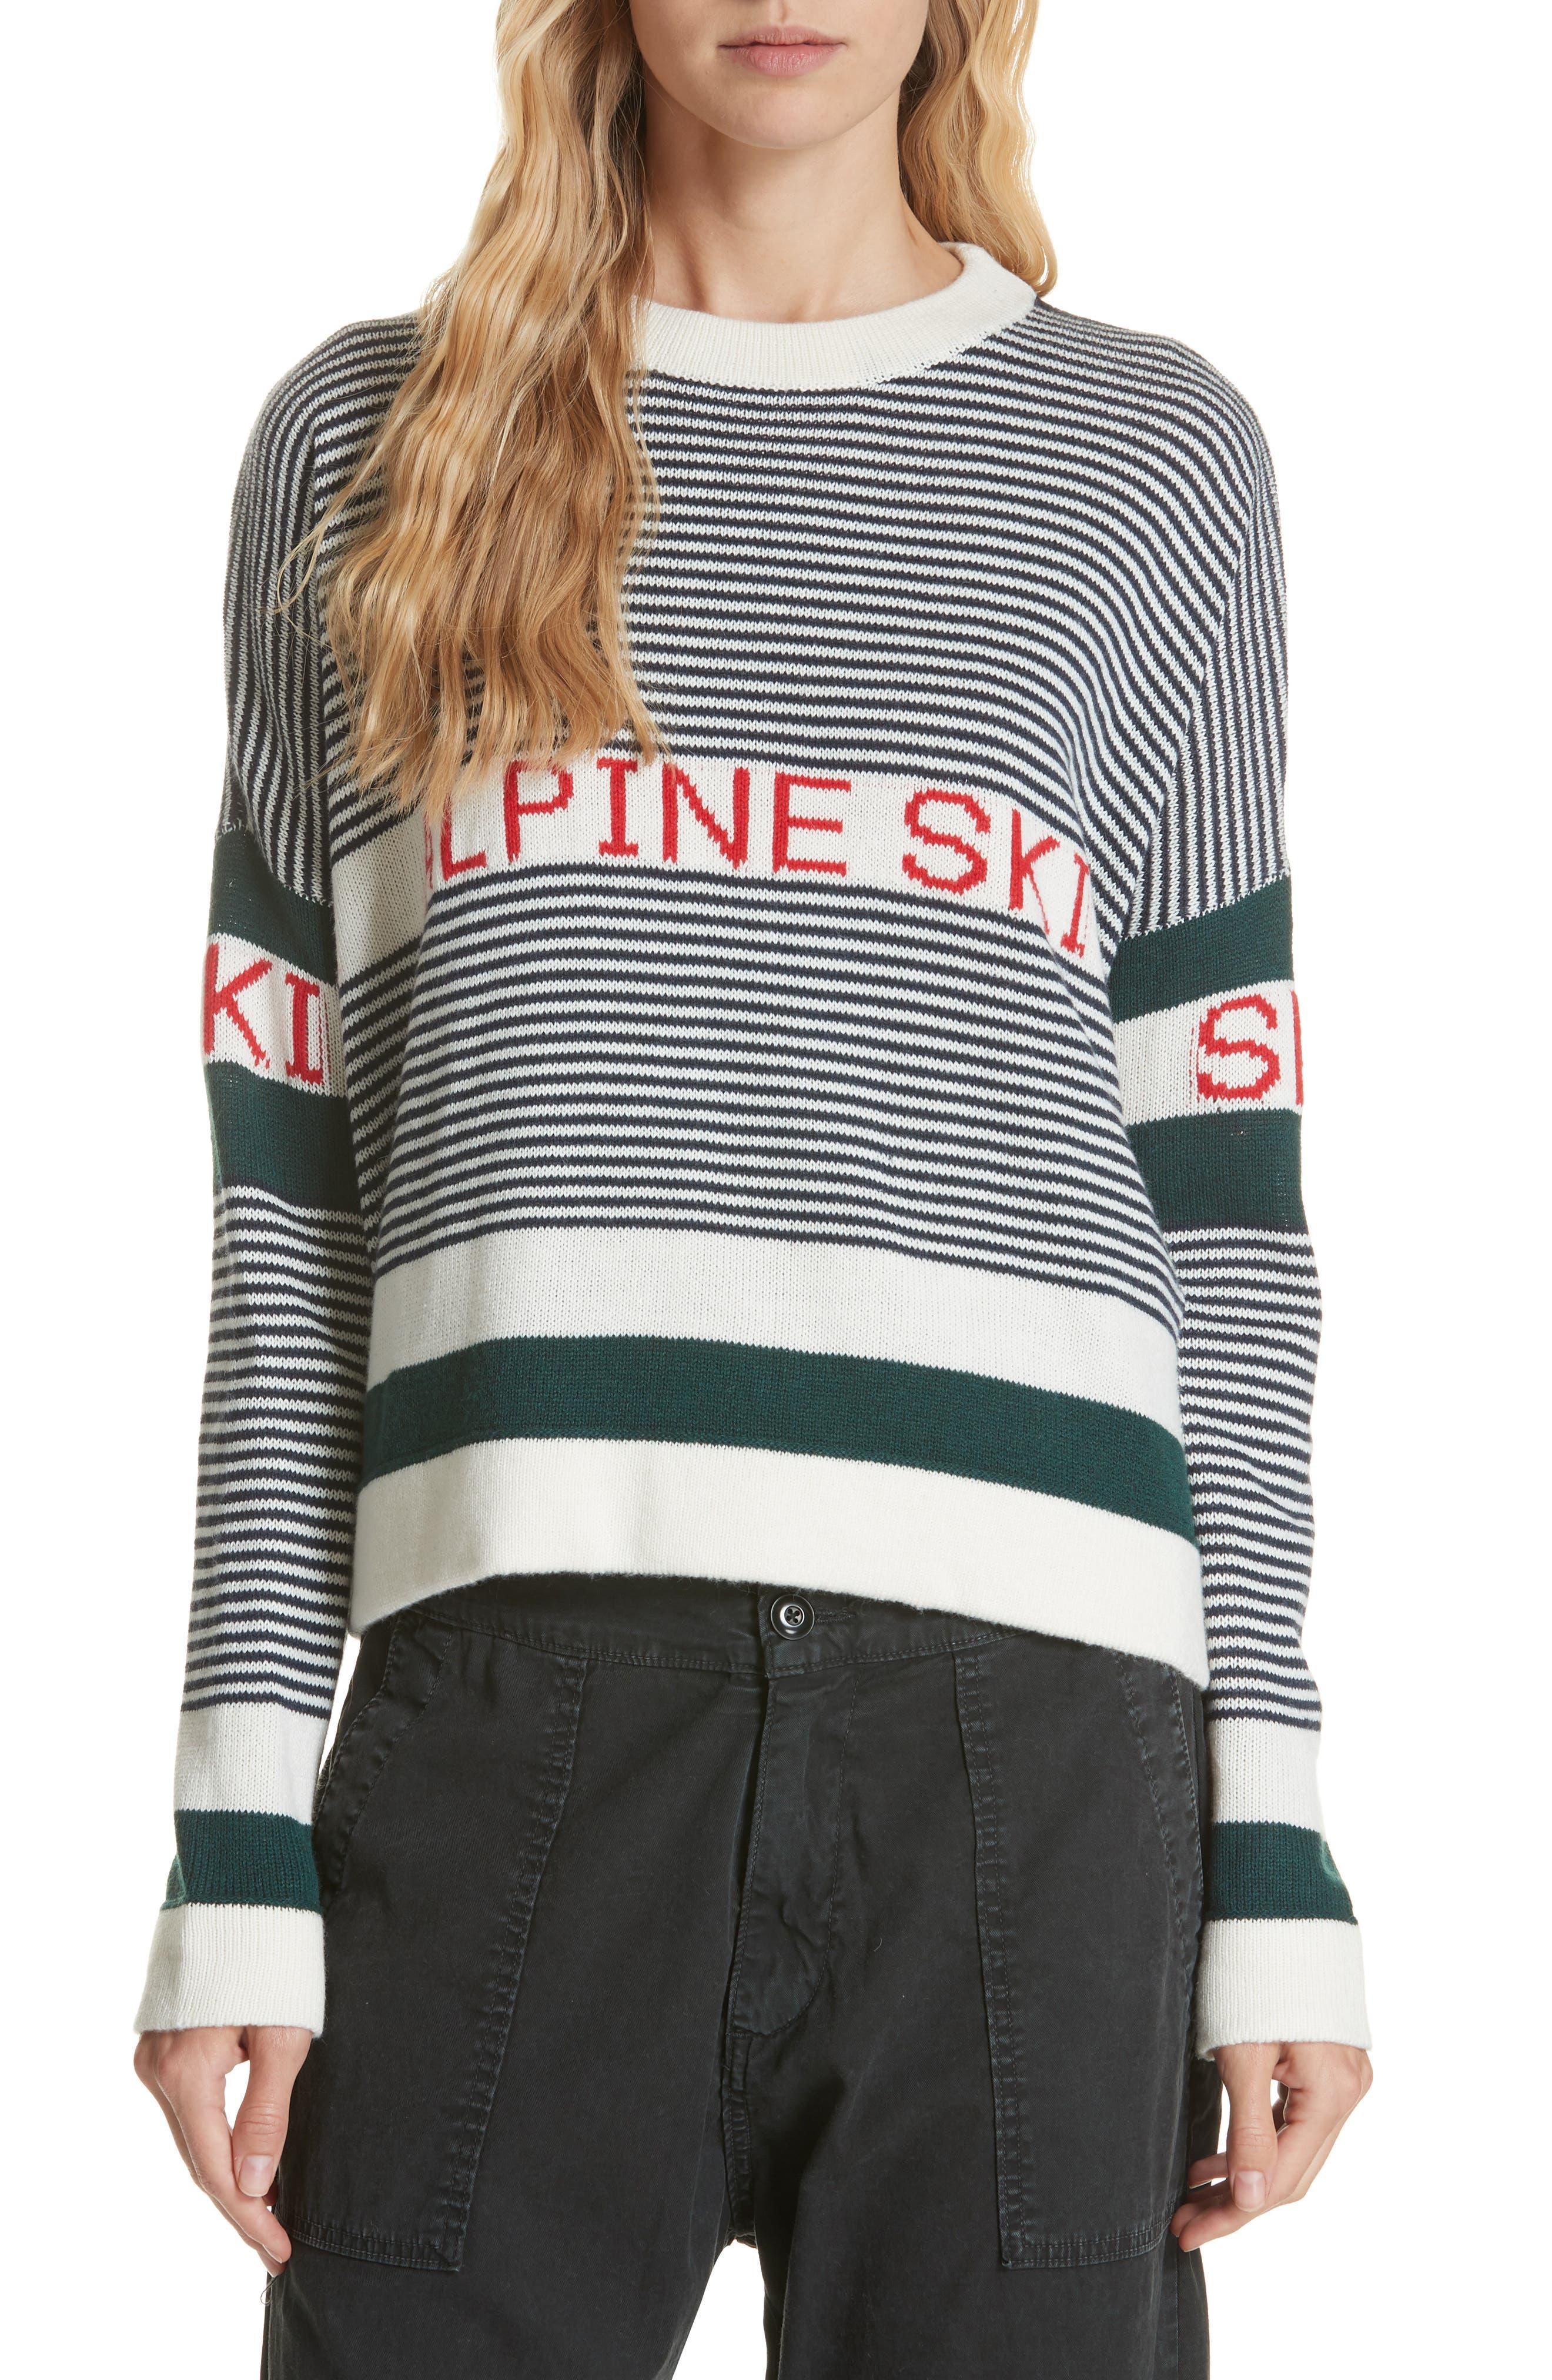 Alpine Ski Sweater,                             Main thumbnail 1, color,                             900